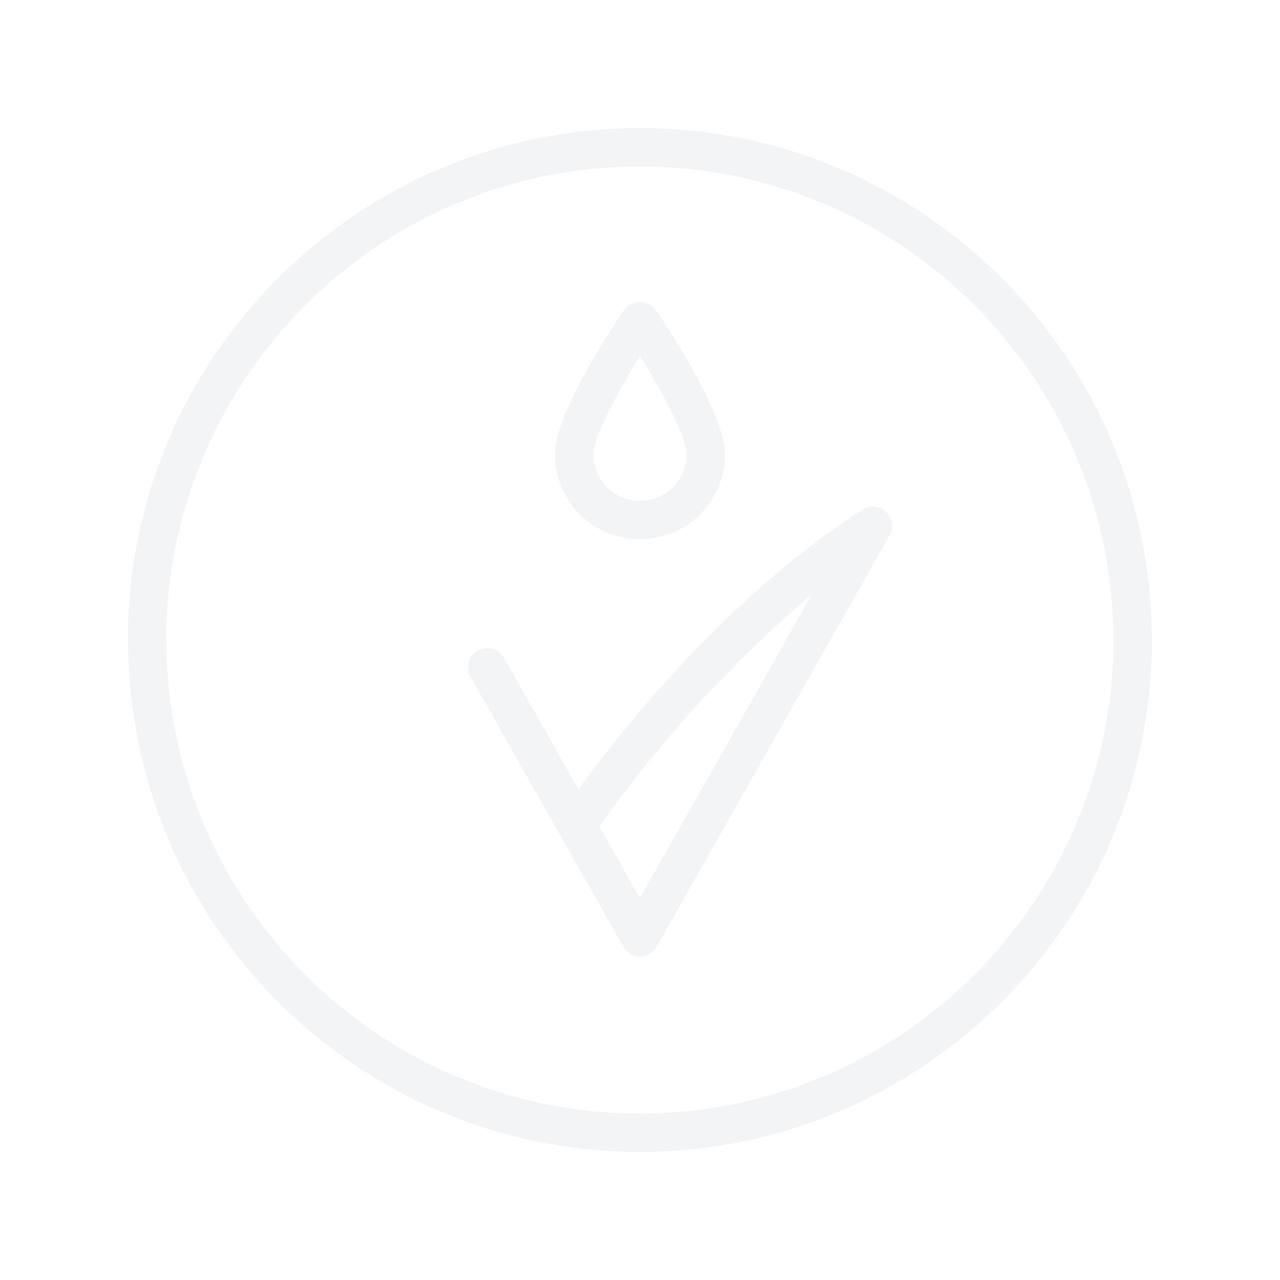 E.L.F. Amazing Angles Contour Palette & Brush Gift Set подарочный набор